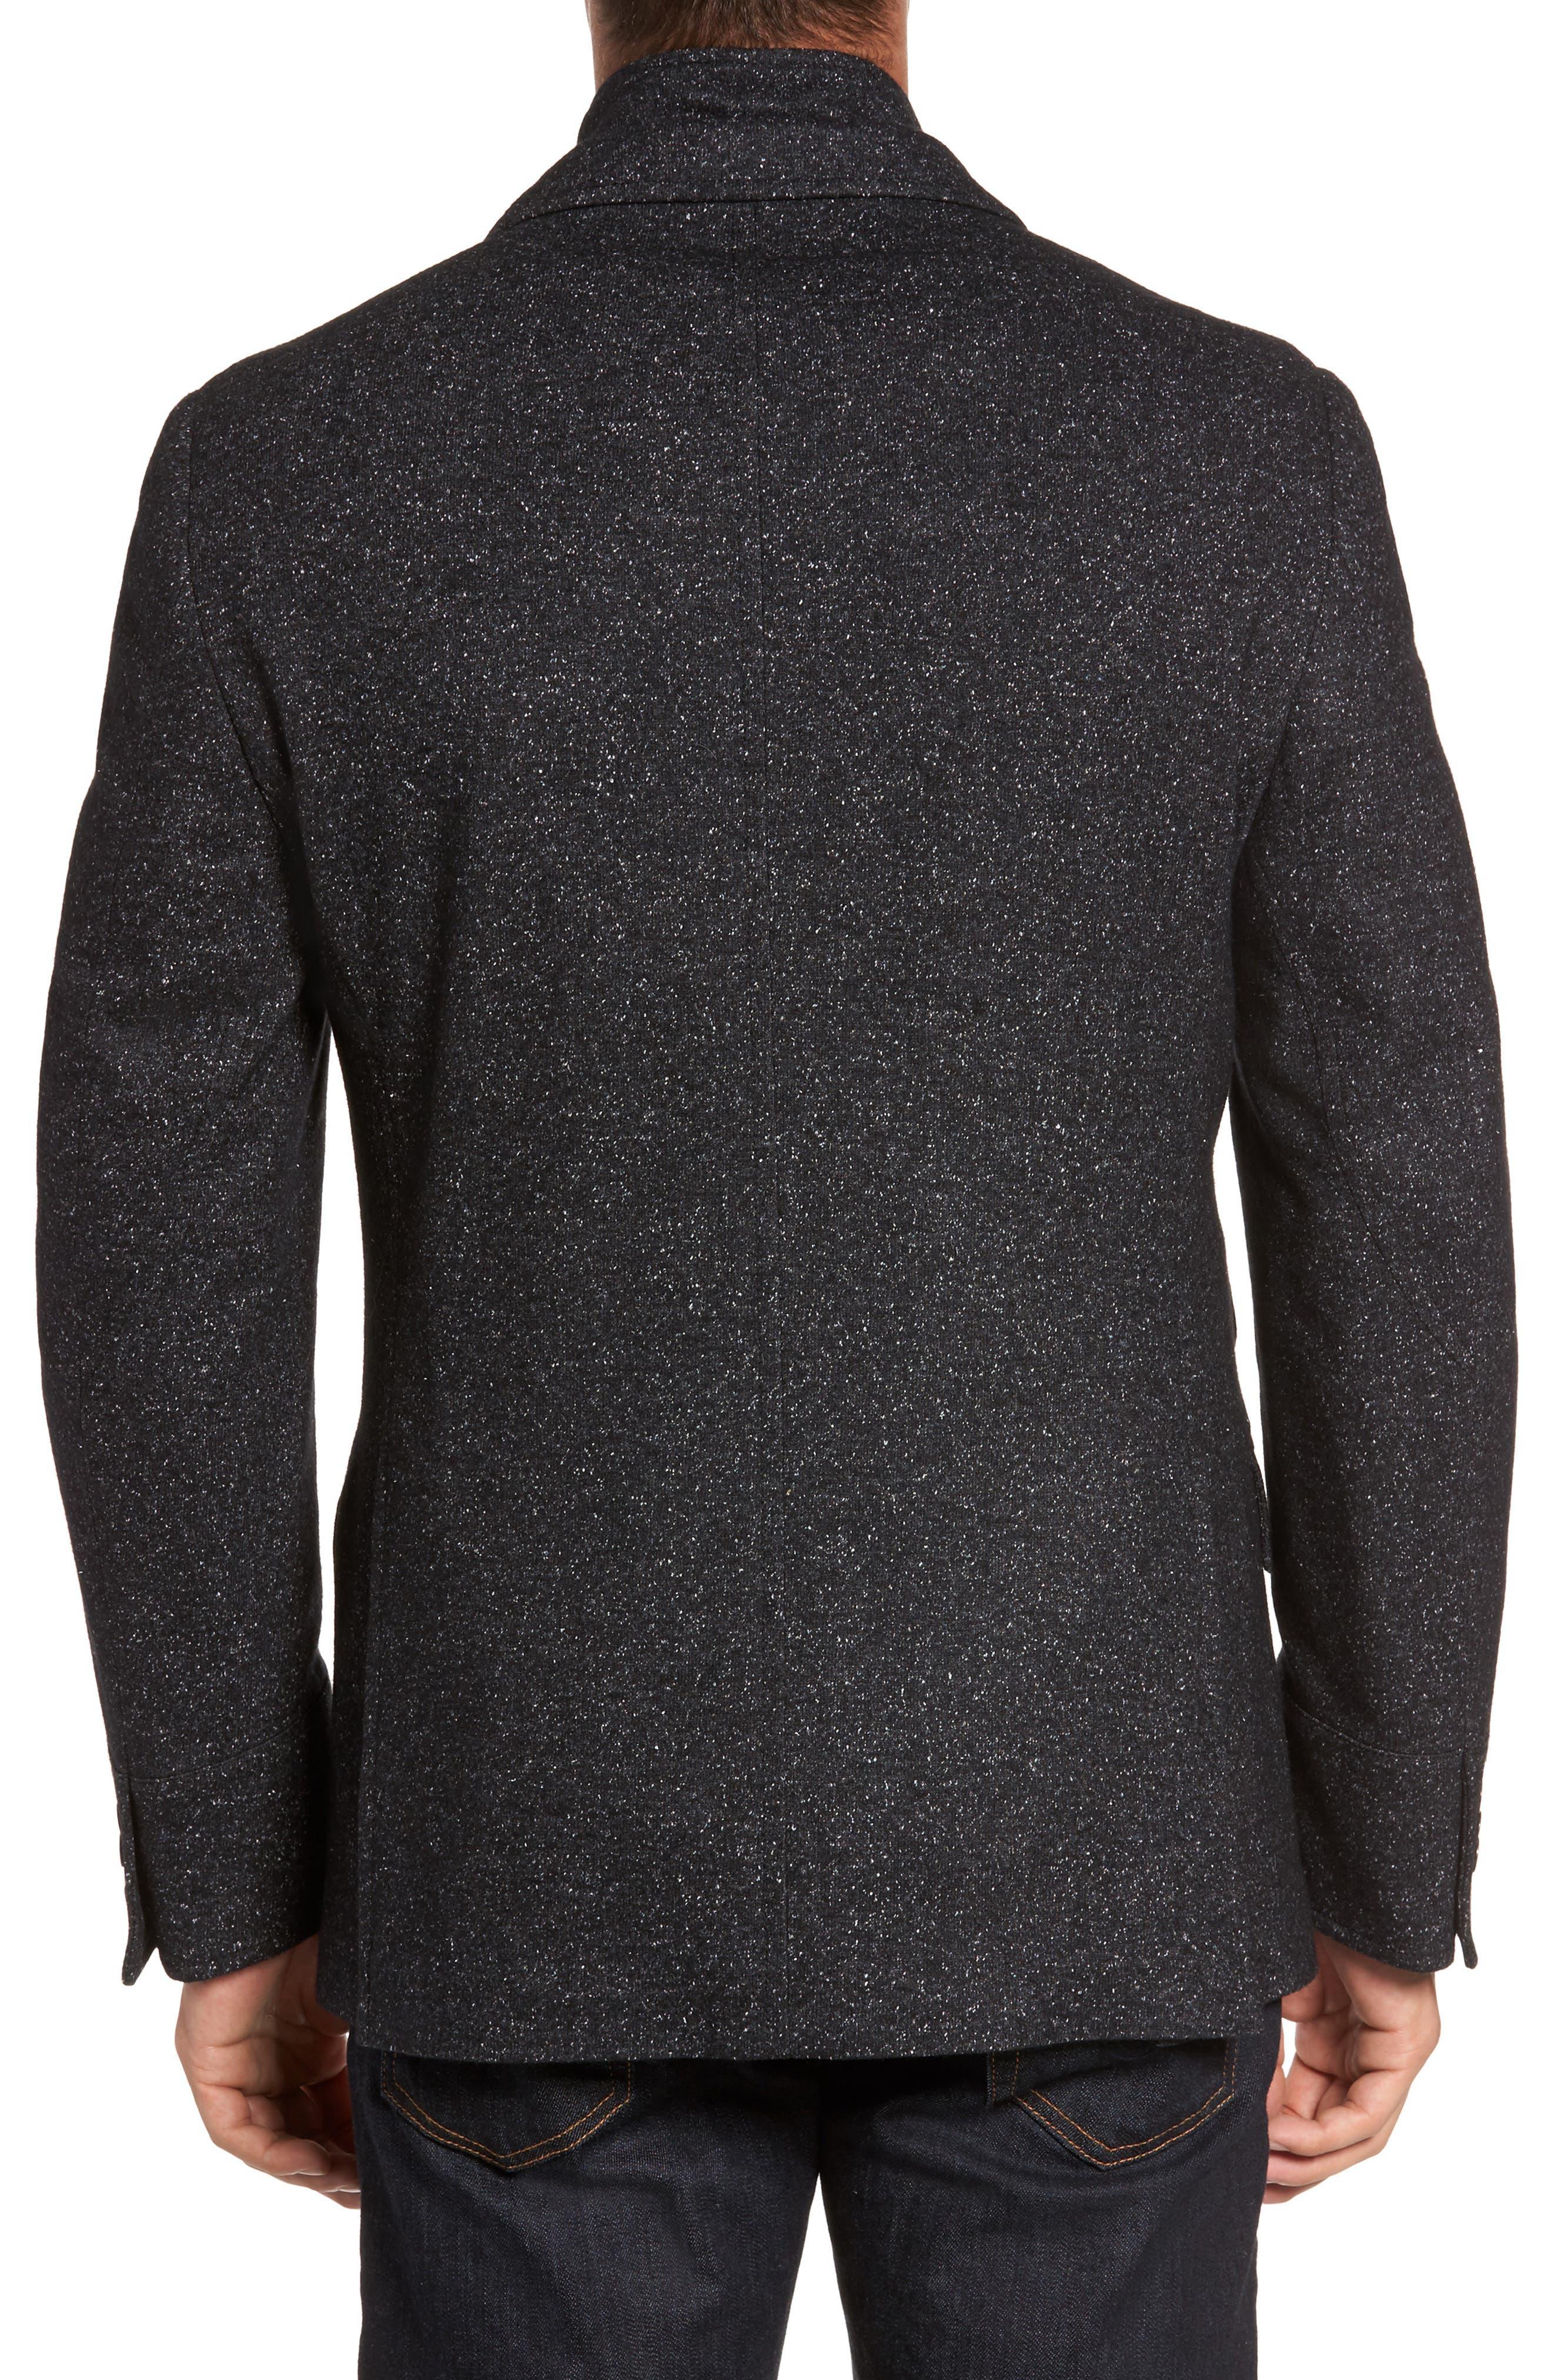 Donegal Wool Blend Hybrid Coat,                             Alternate thumbnail 2, color,                             Charcoal